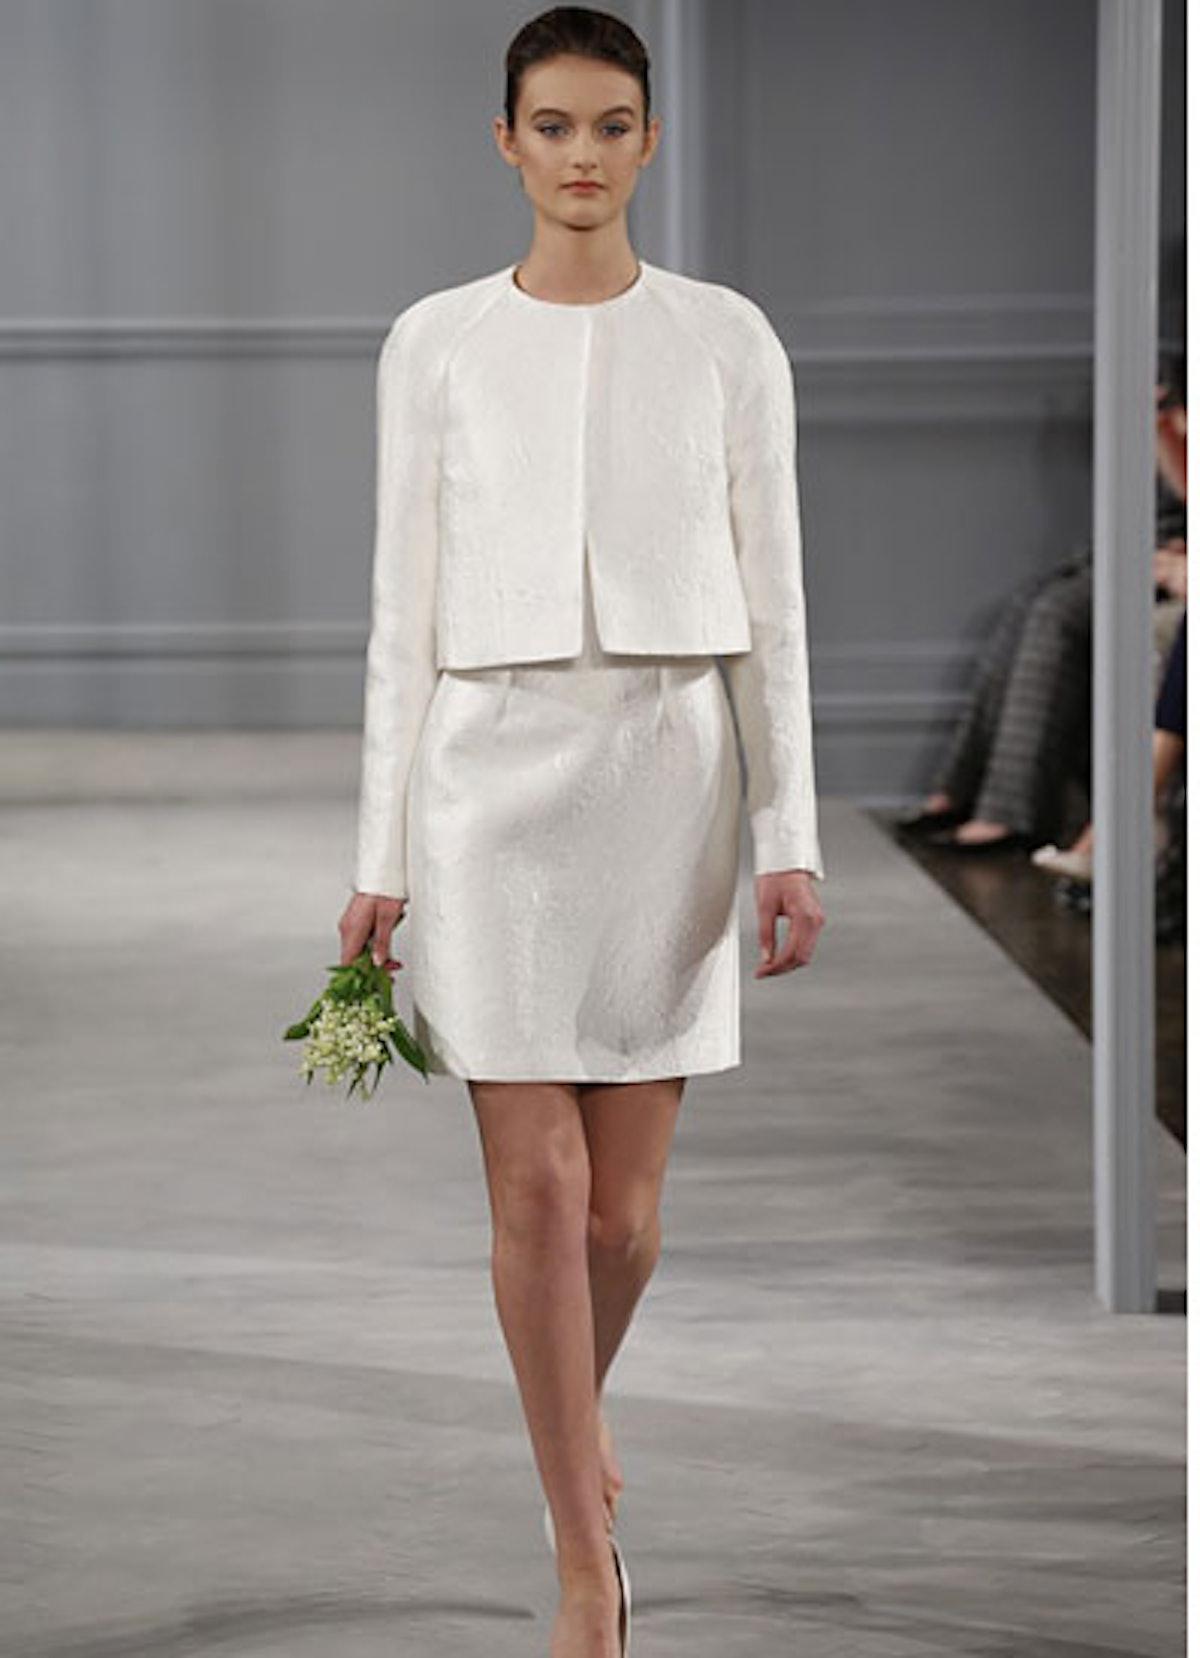 fass-wedding-dress-09-v.jpg